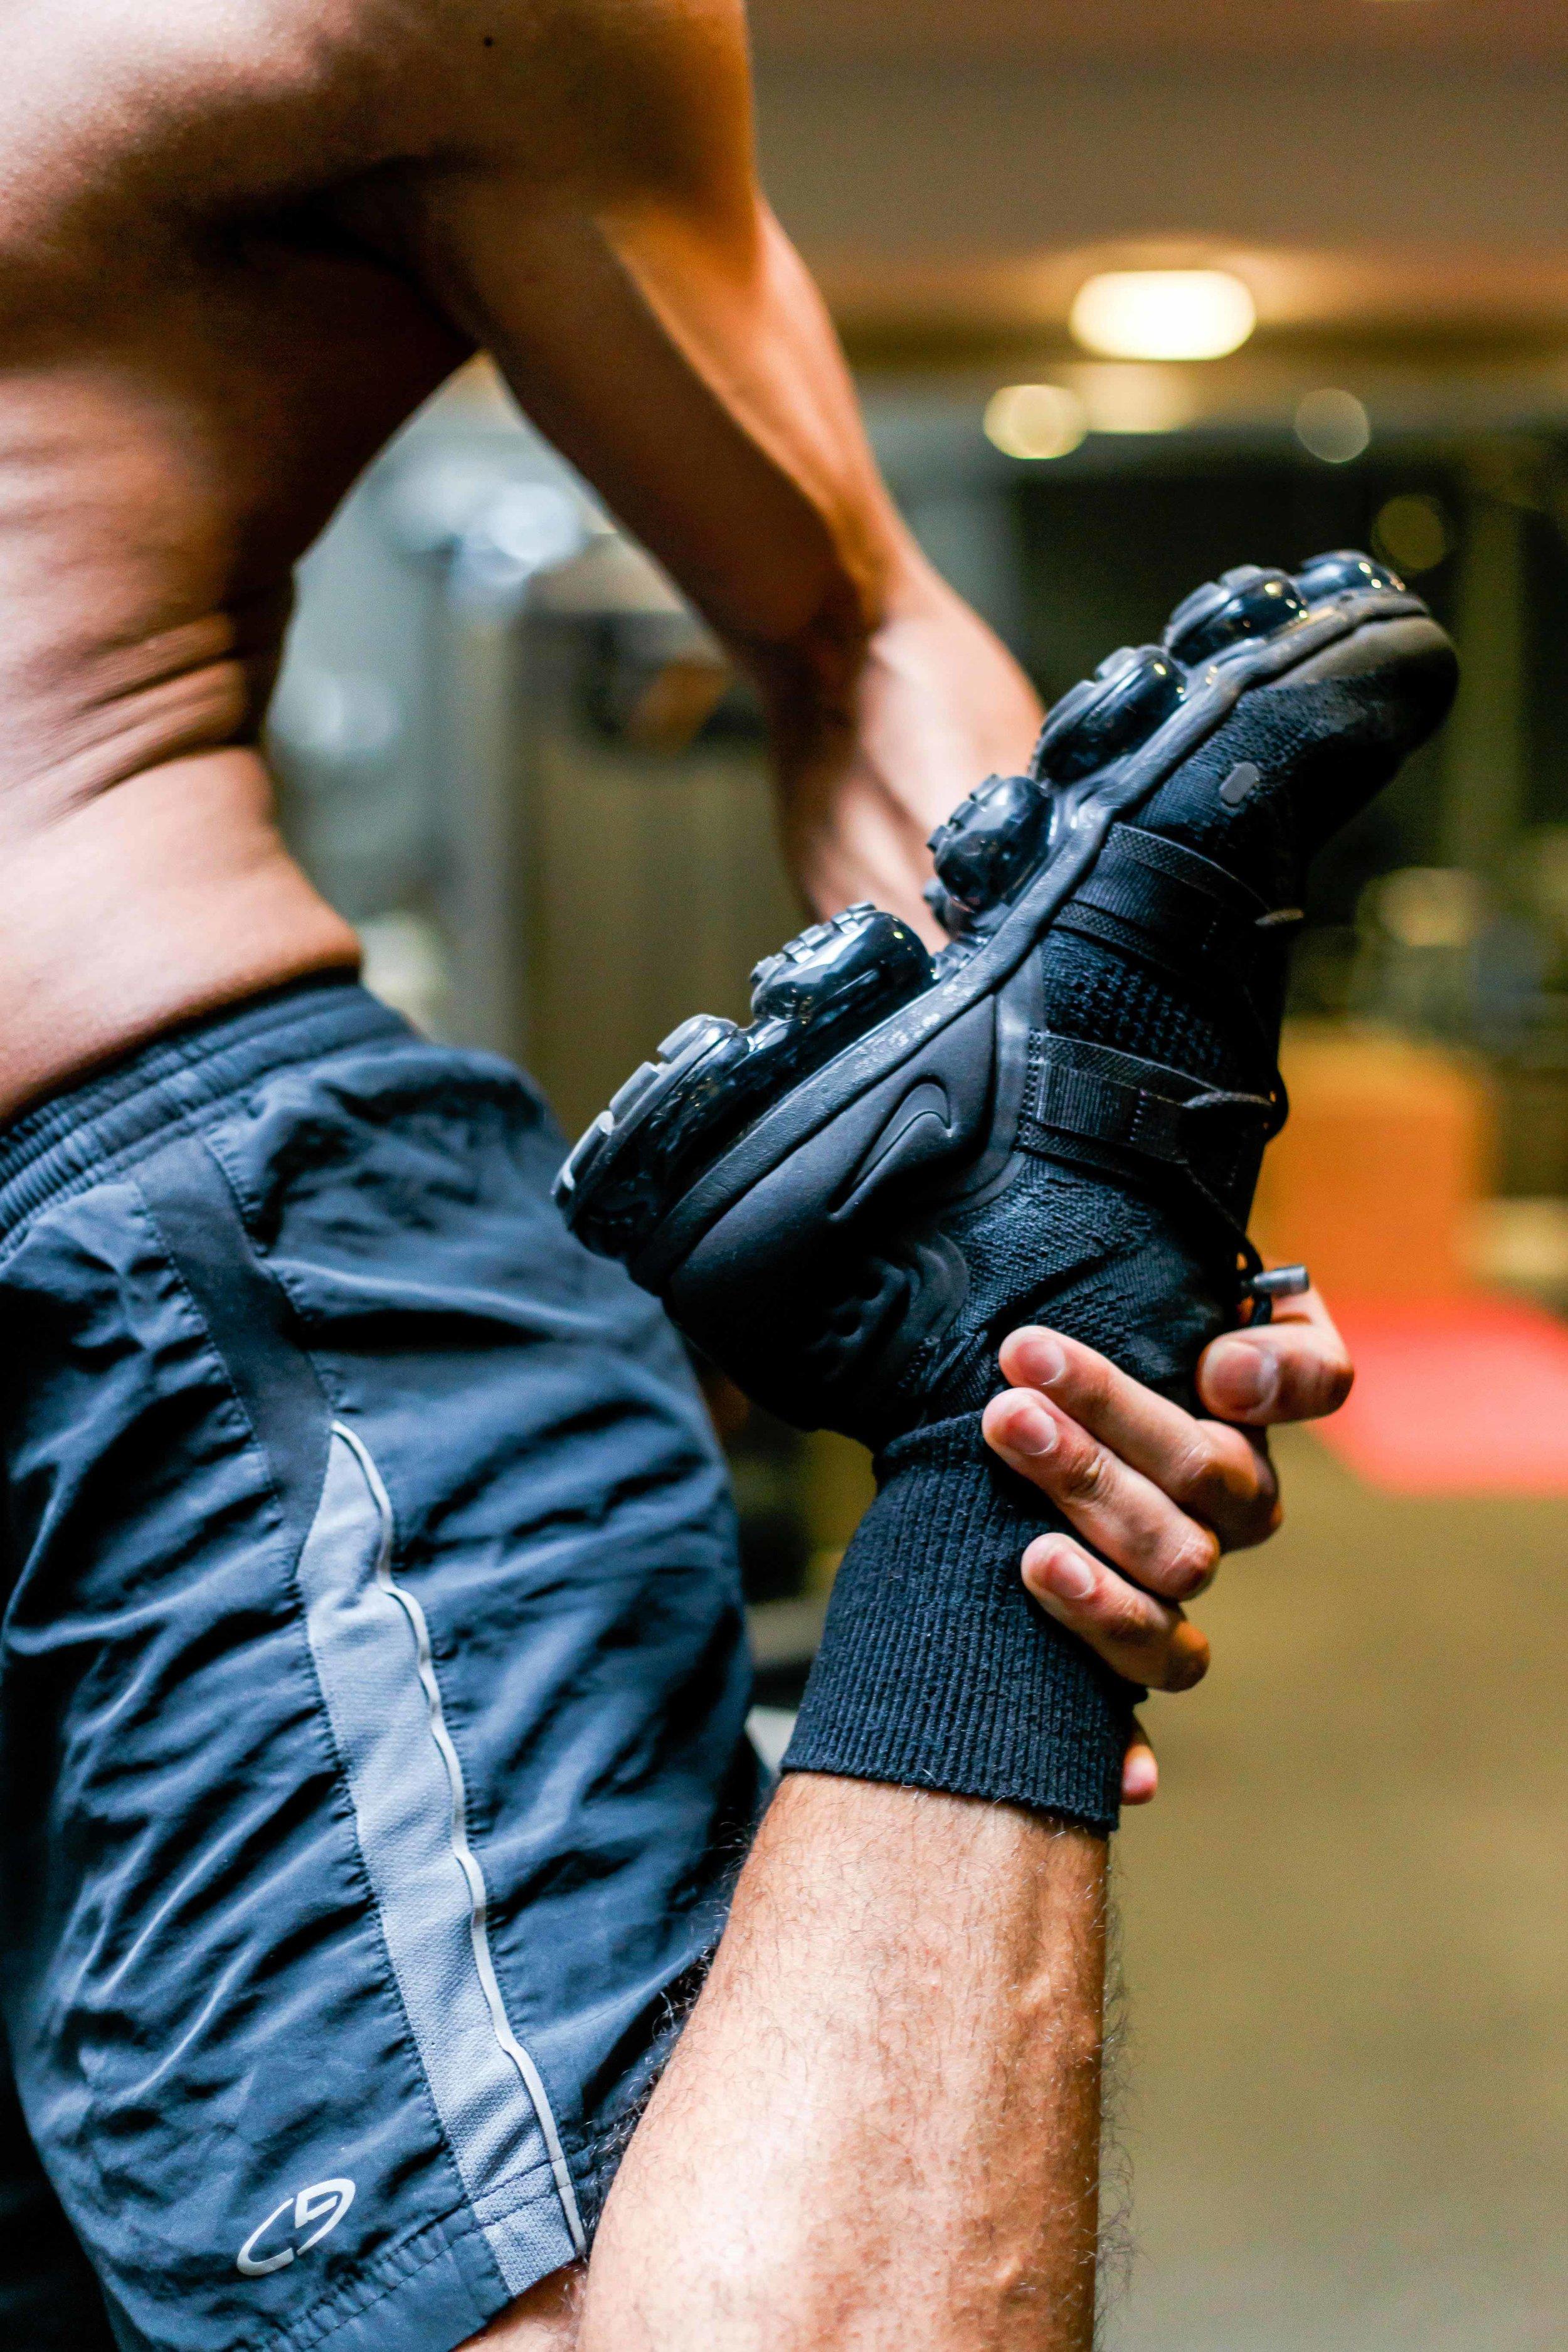 Nike VaporMax: Fashion to Fitness